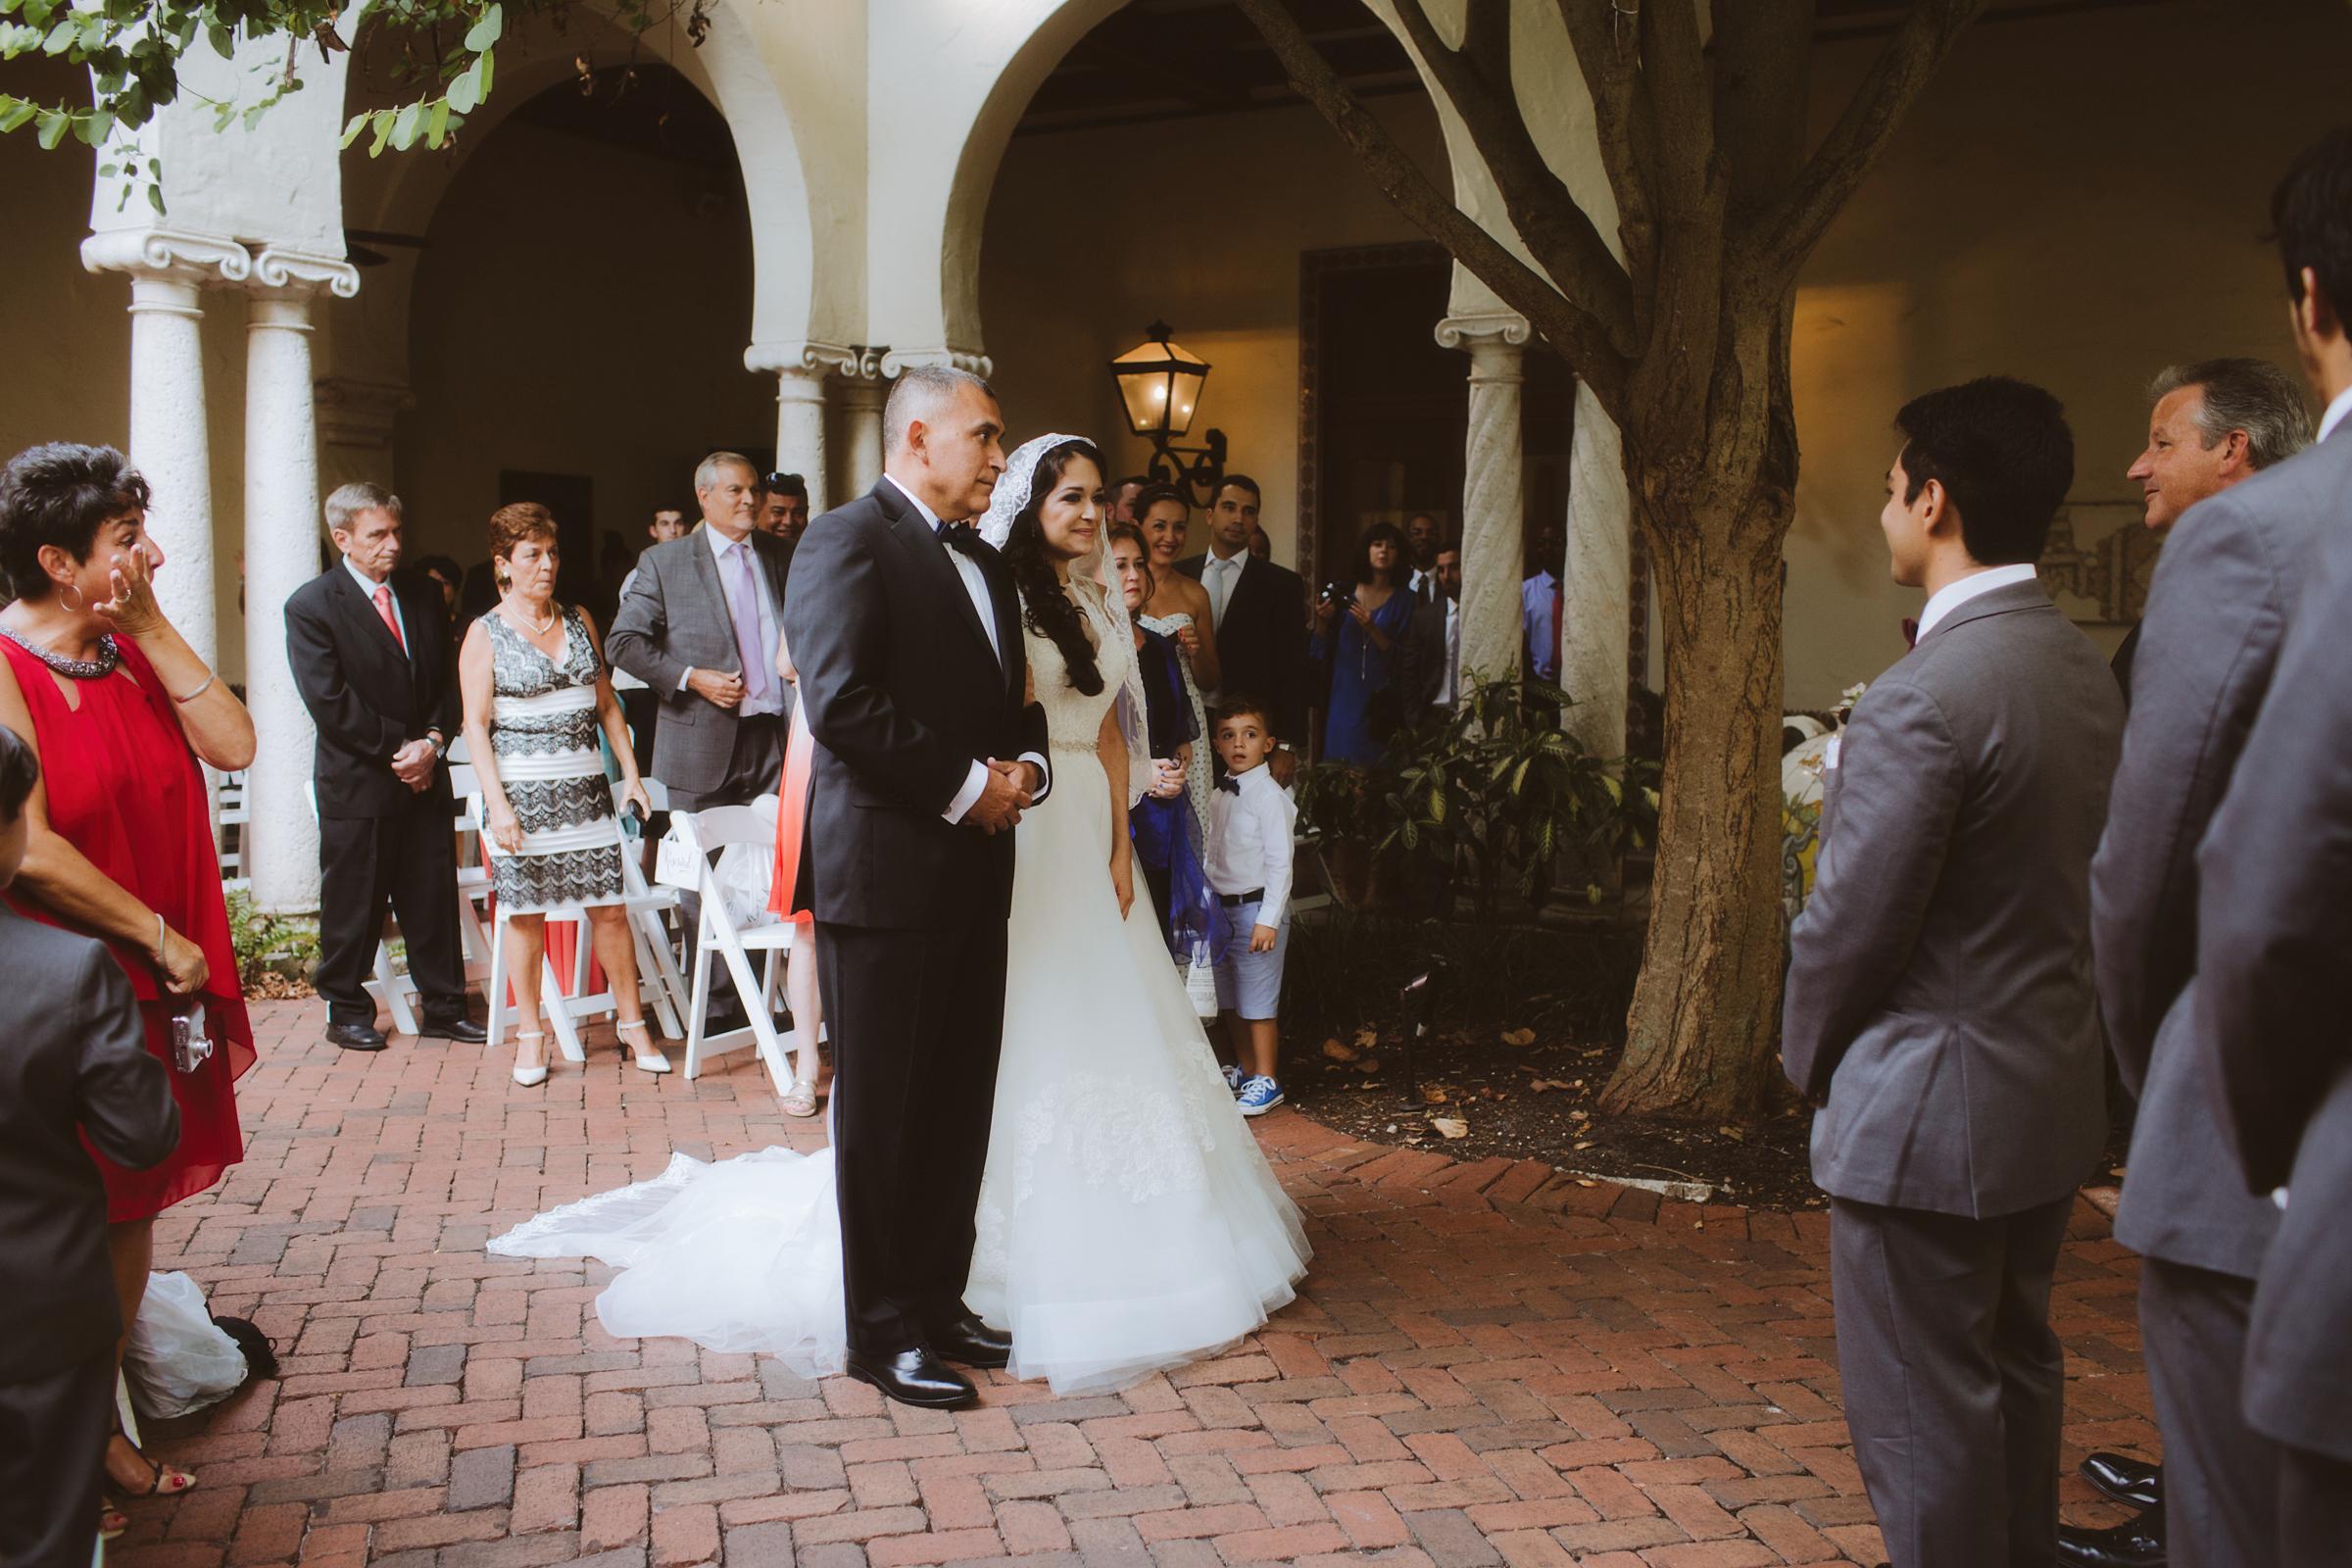 wedding day | MFA St Pete | Vanessa Boy Photography | vanessaboy.com-330.com |final.jpg